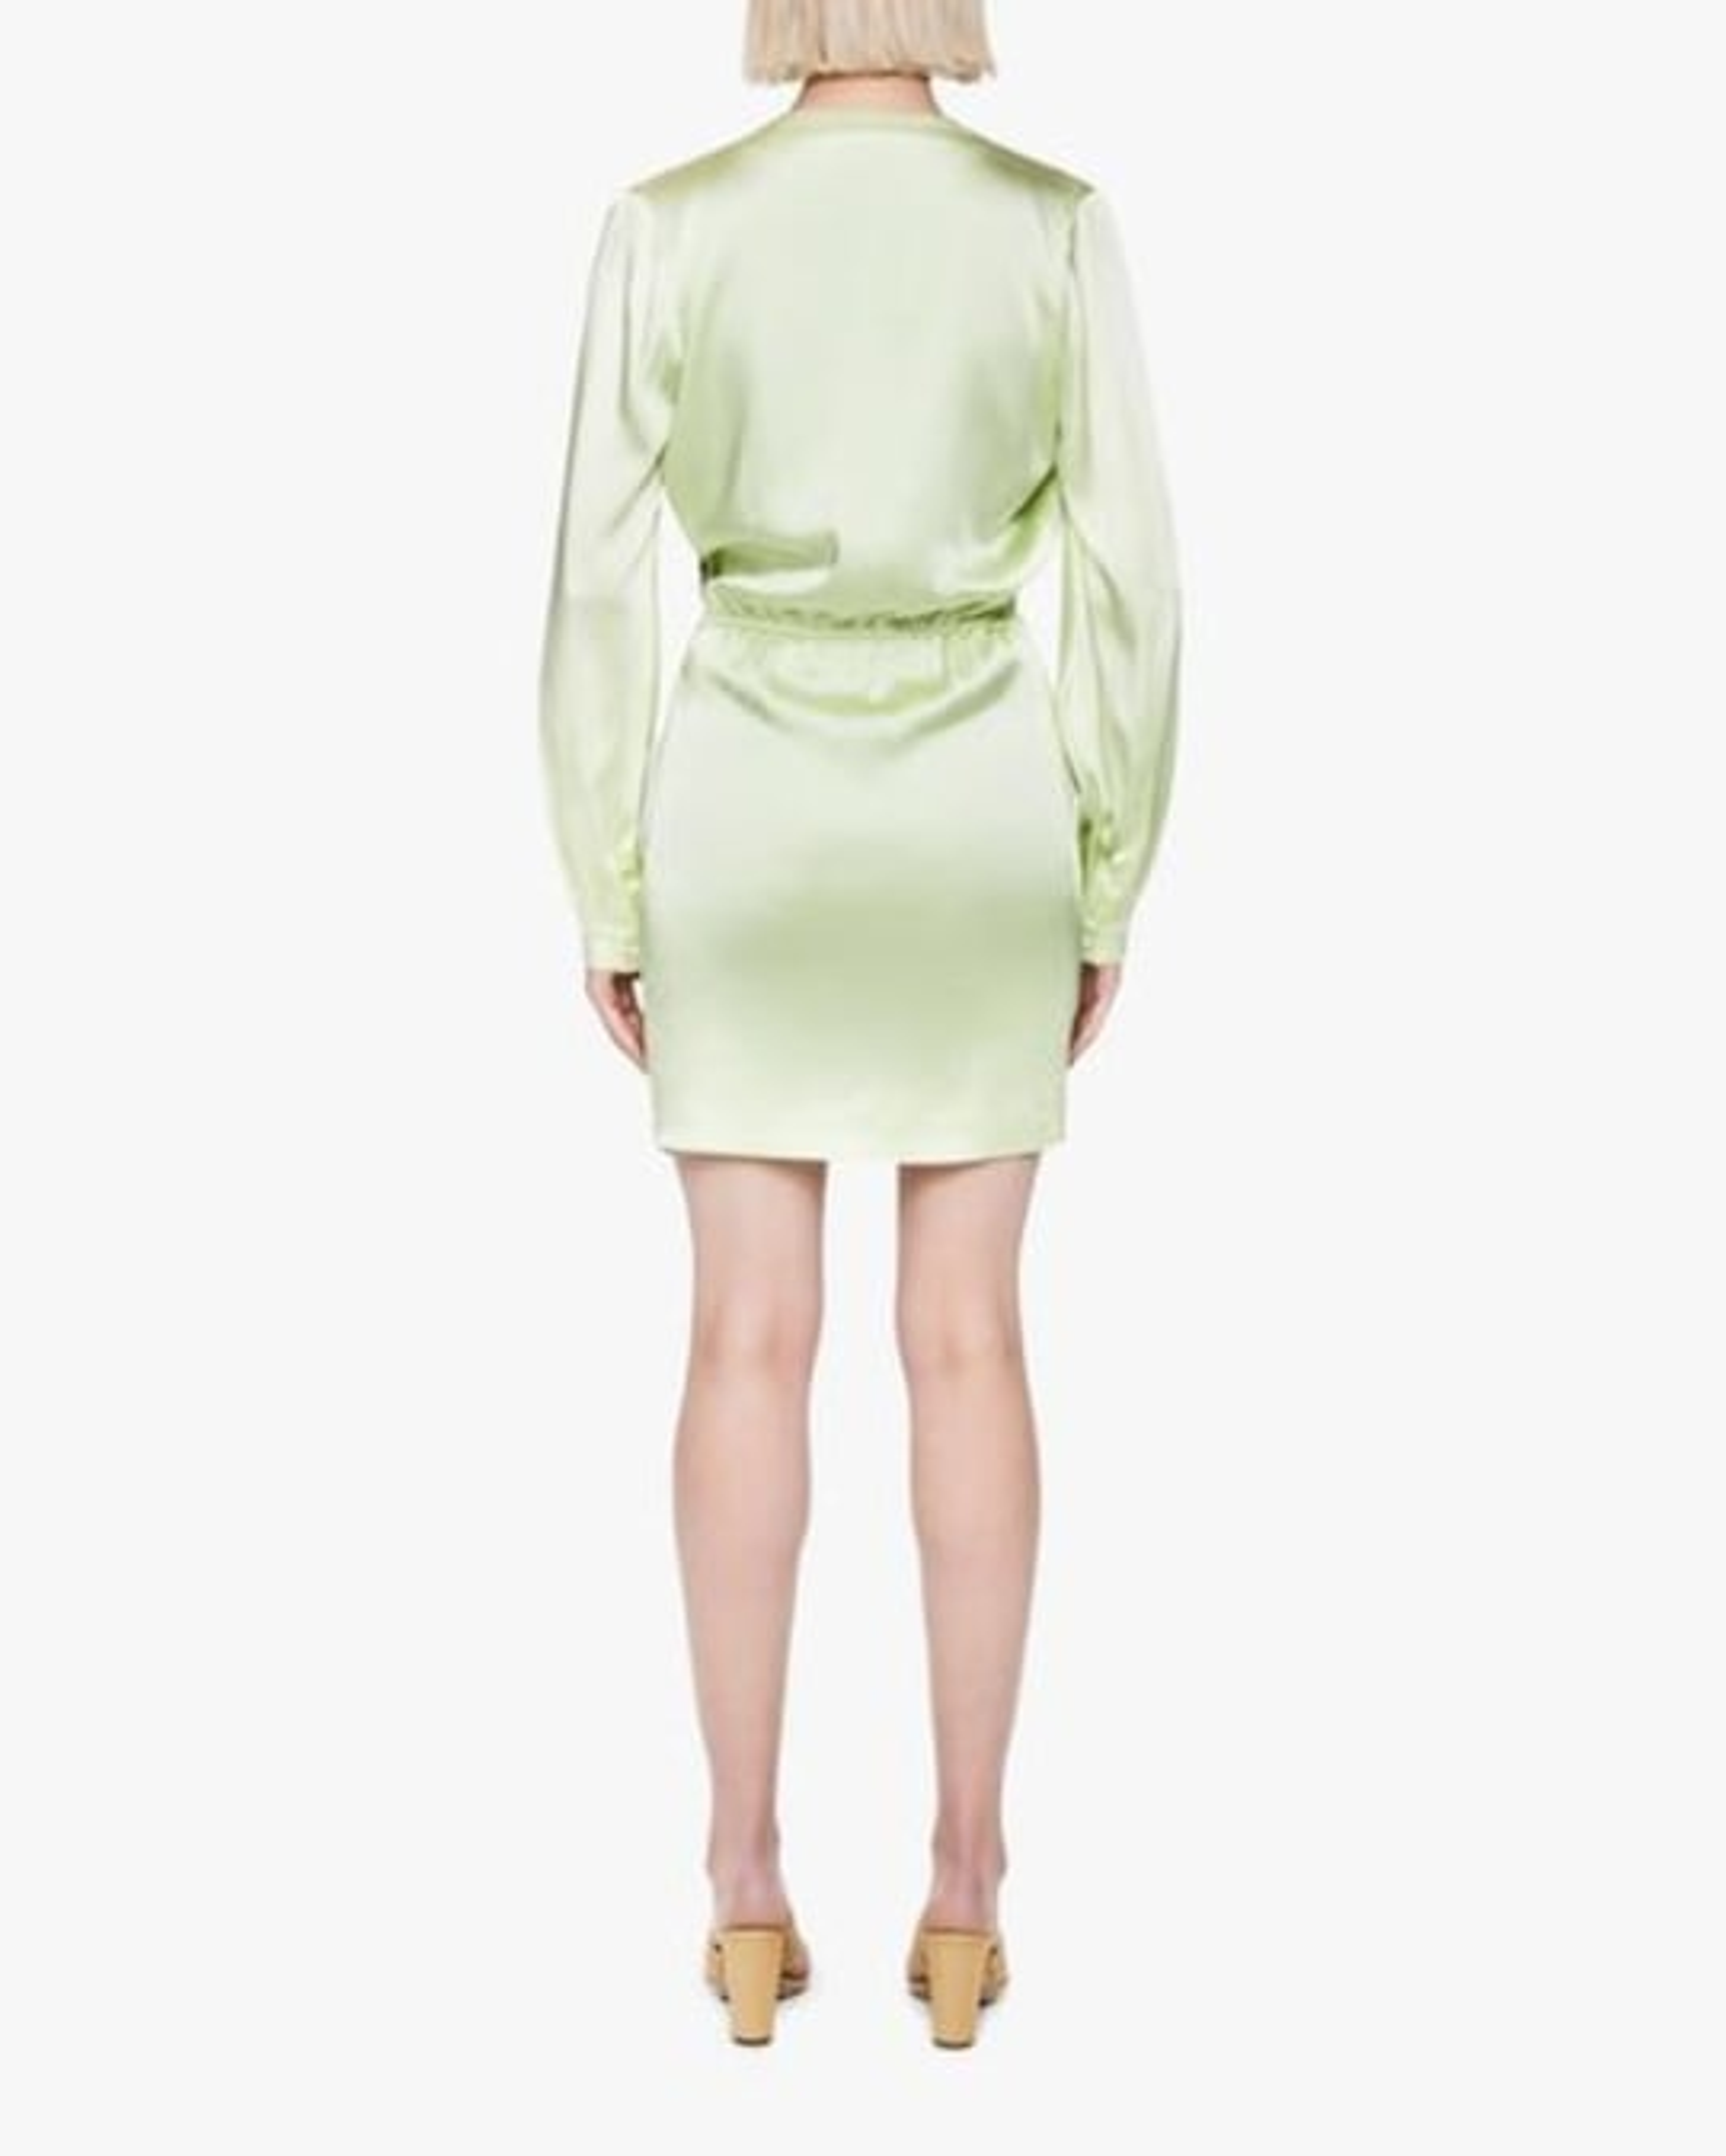 Jonathan Simkhai Justine Fluid Satin Mini Dress 1